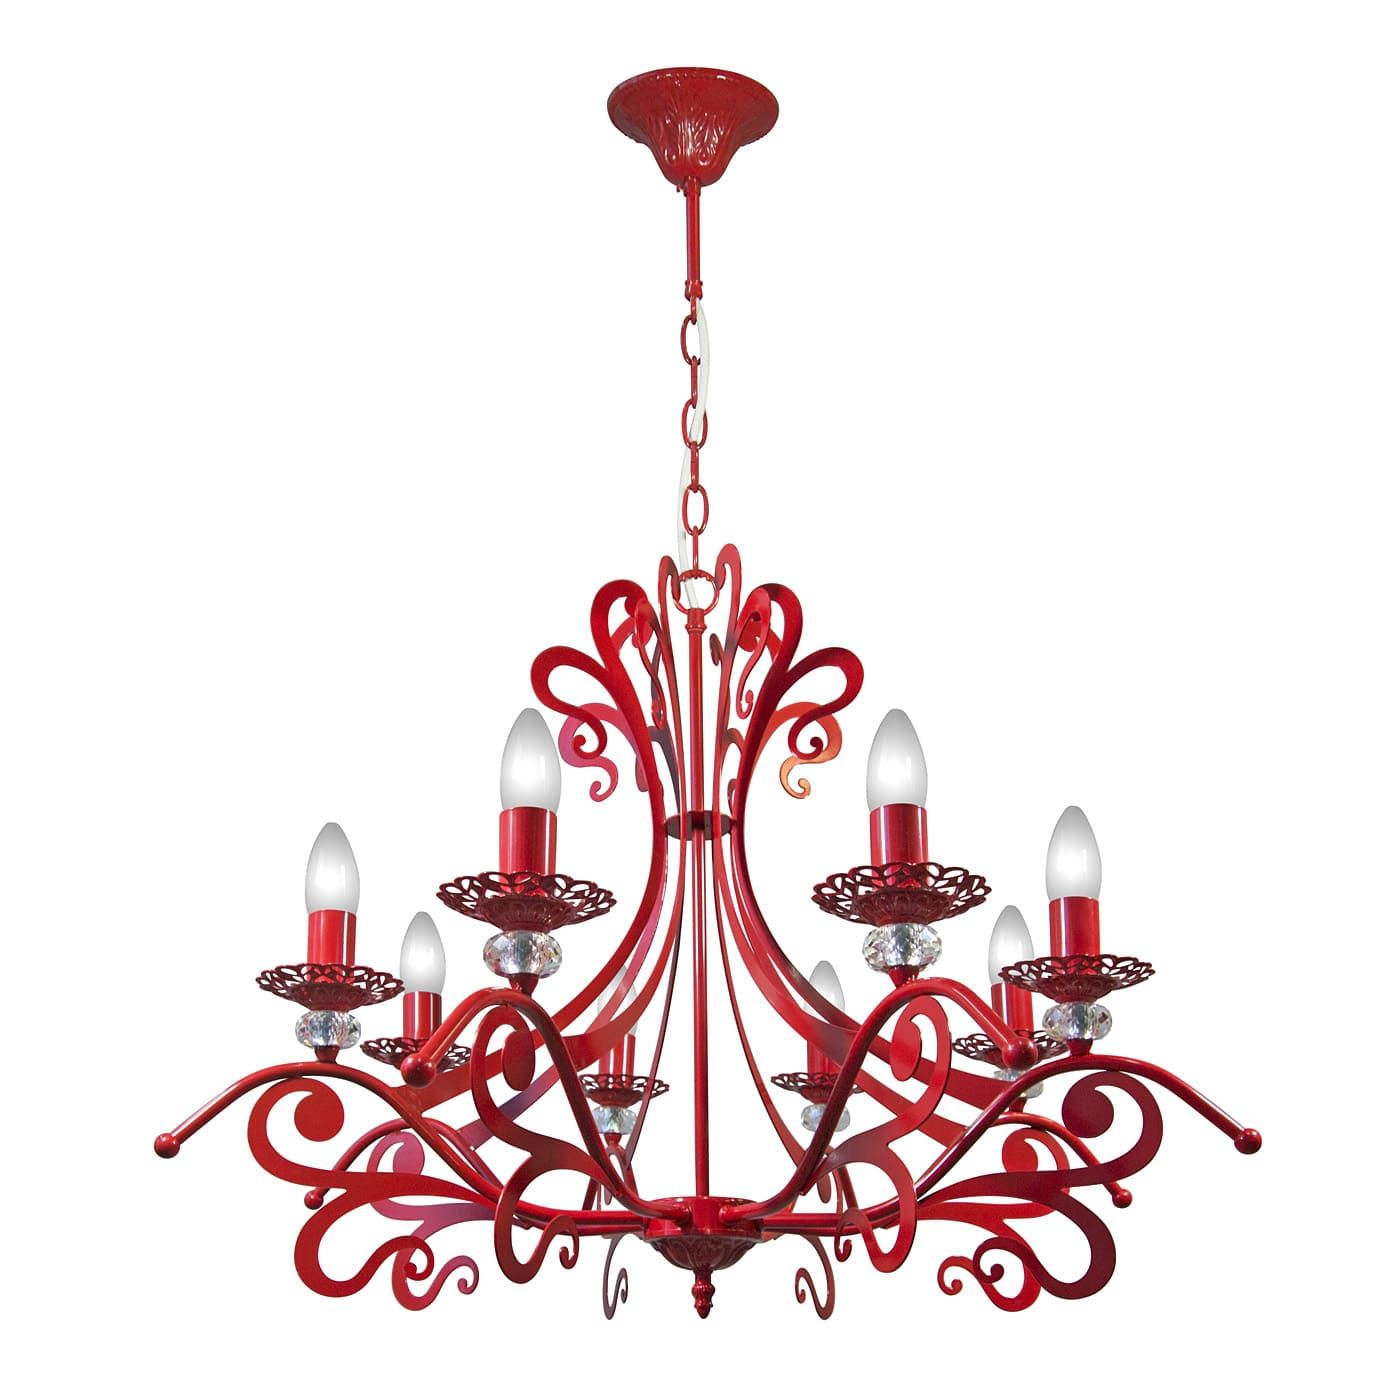 PETRASVET / Pendant chandelier S3129-8, 8xE14 max. 60W